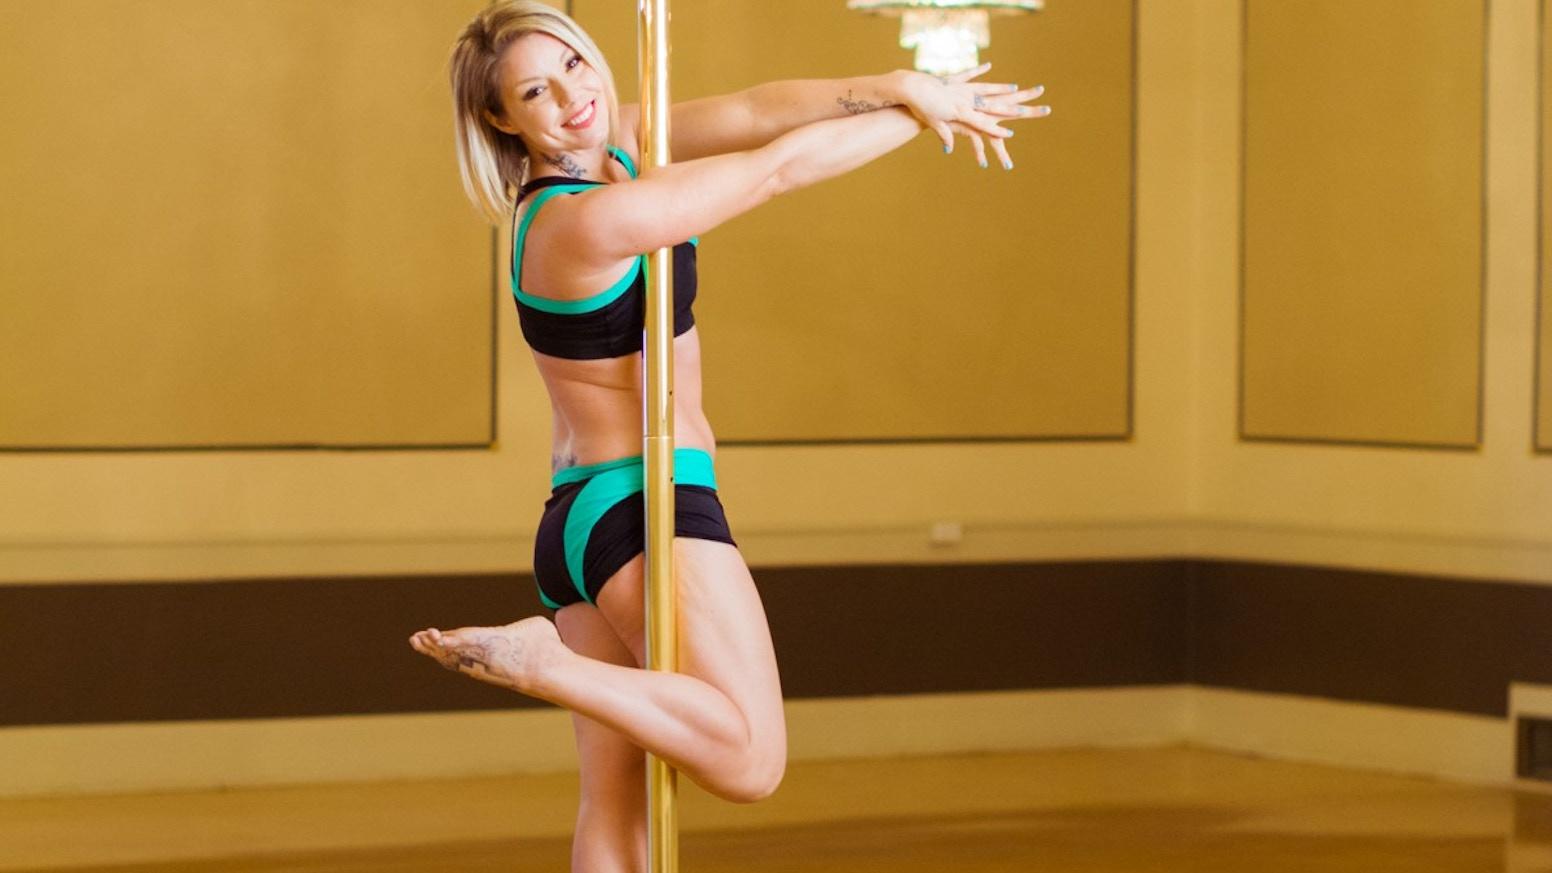 a6c1eb3a06 Pole dance fitness studio opening in Spokane, Washington! by Brittni ...